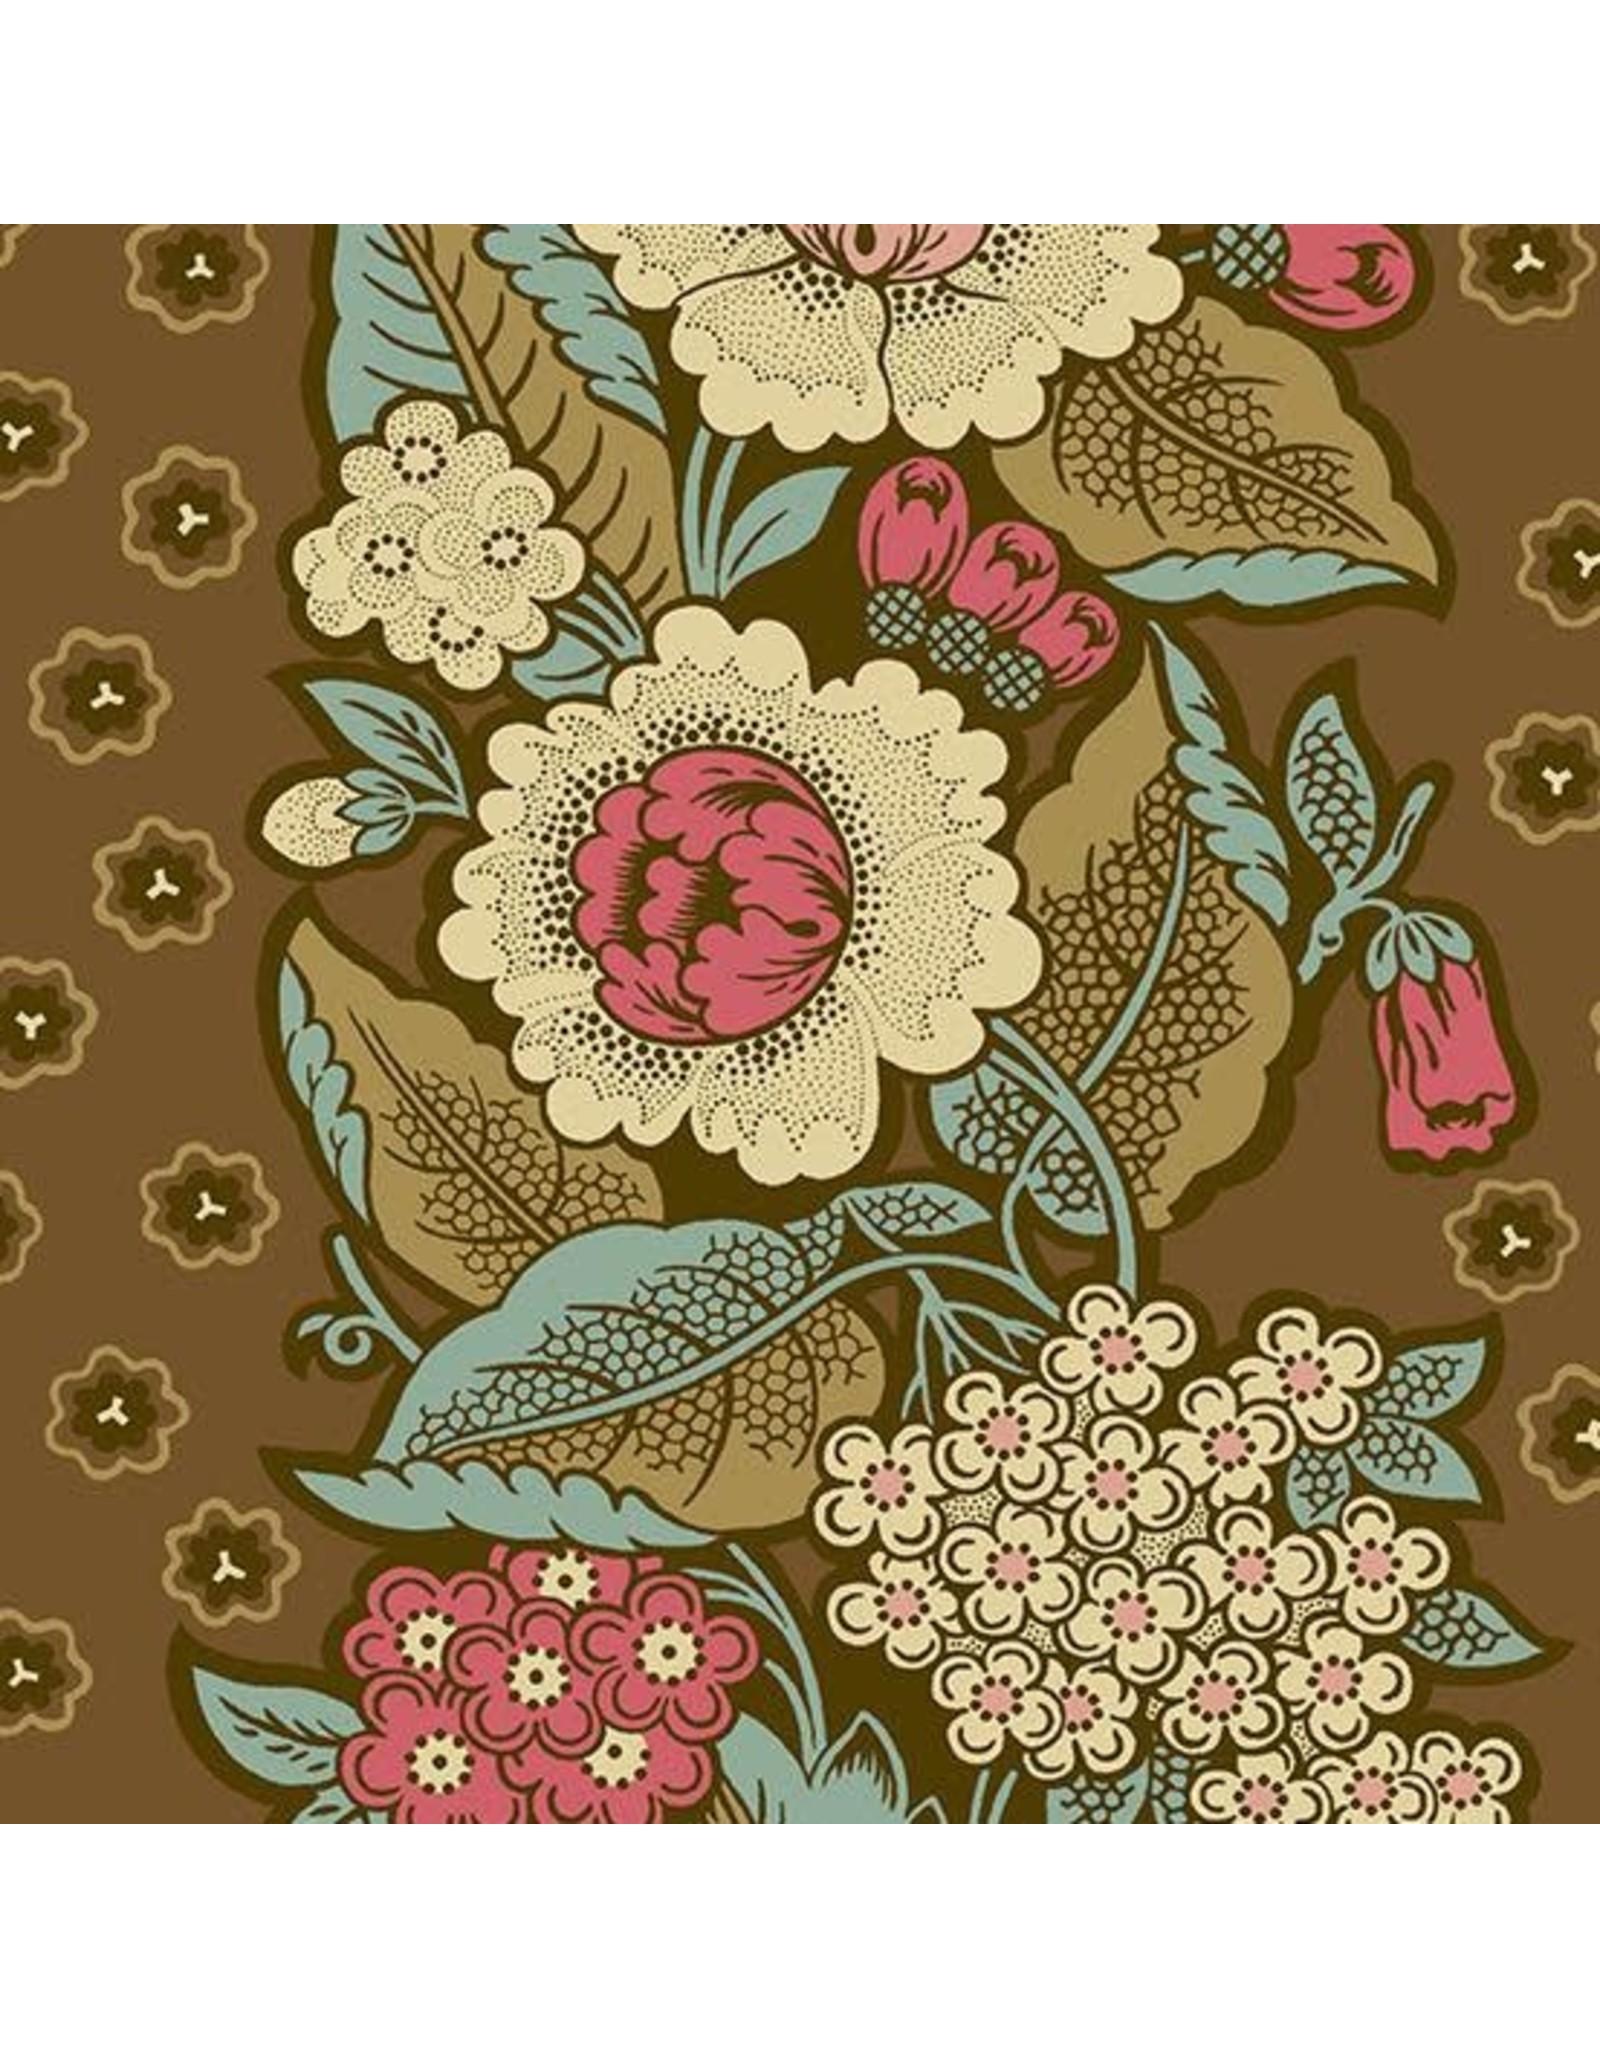 Andover Fabrics ON SALE-Chesapeake, Bouquet in Dark Khaki, Fabric FULL-Yards